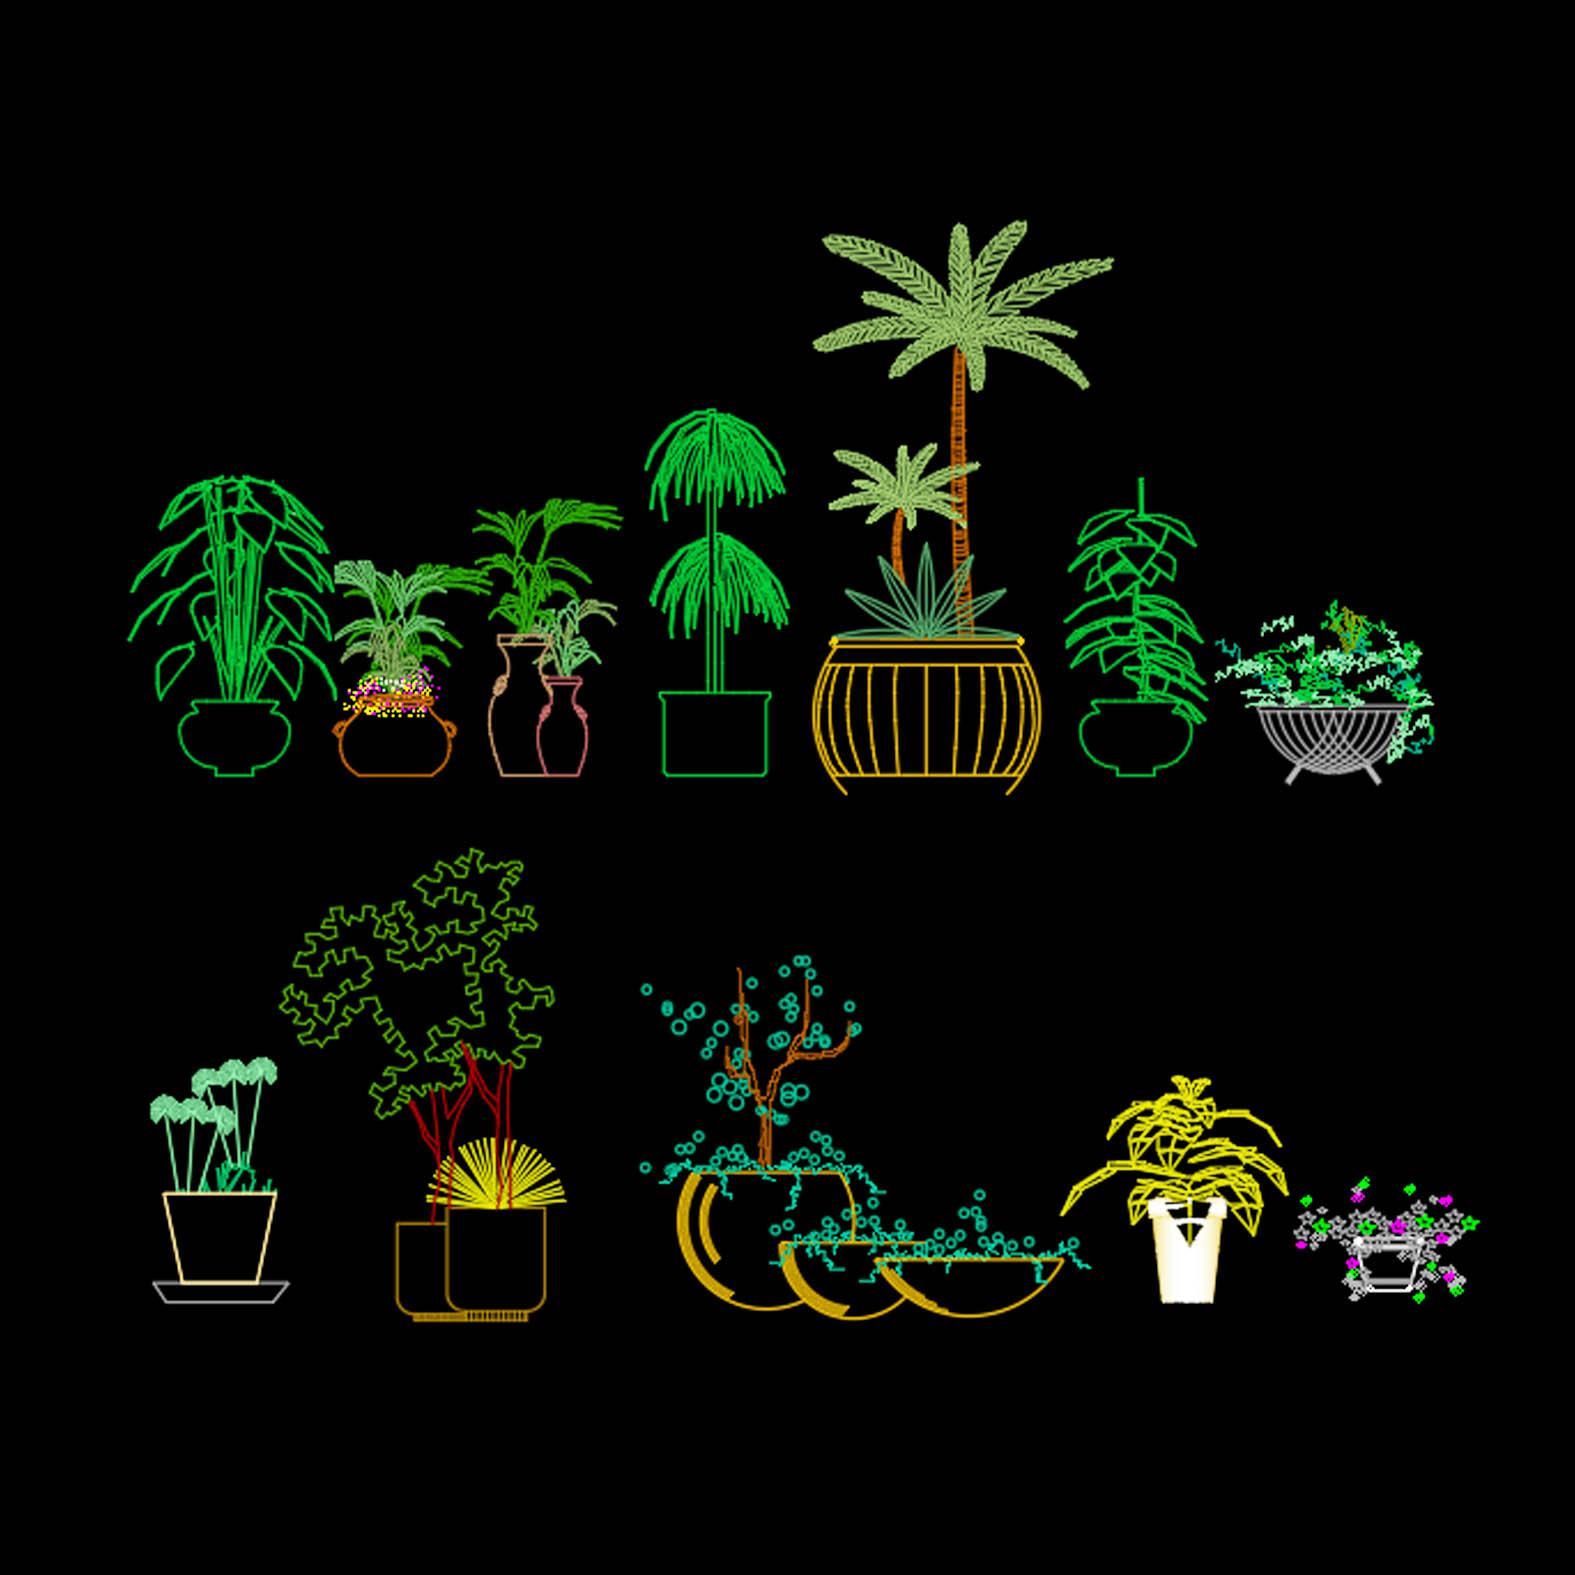 Bloques: Plantas en Maceteros